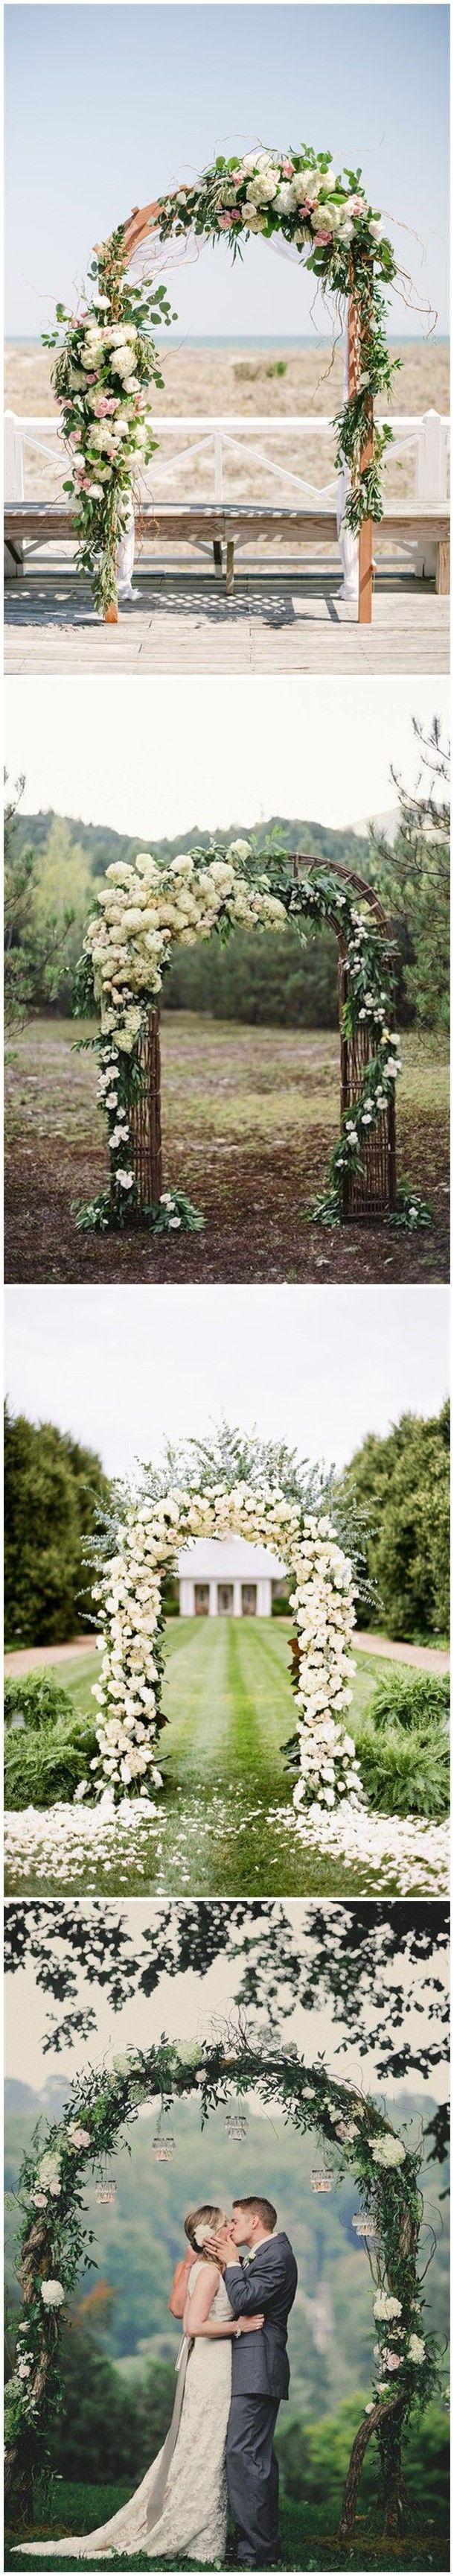 Diy floral wedding arch decoration ideas wallpaper arbor for smartphone hd